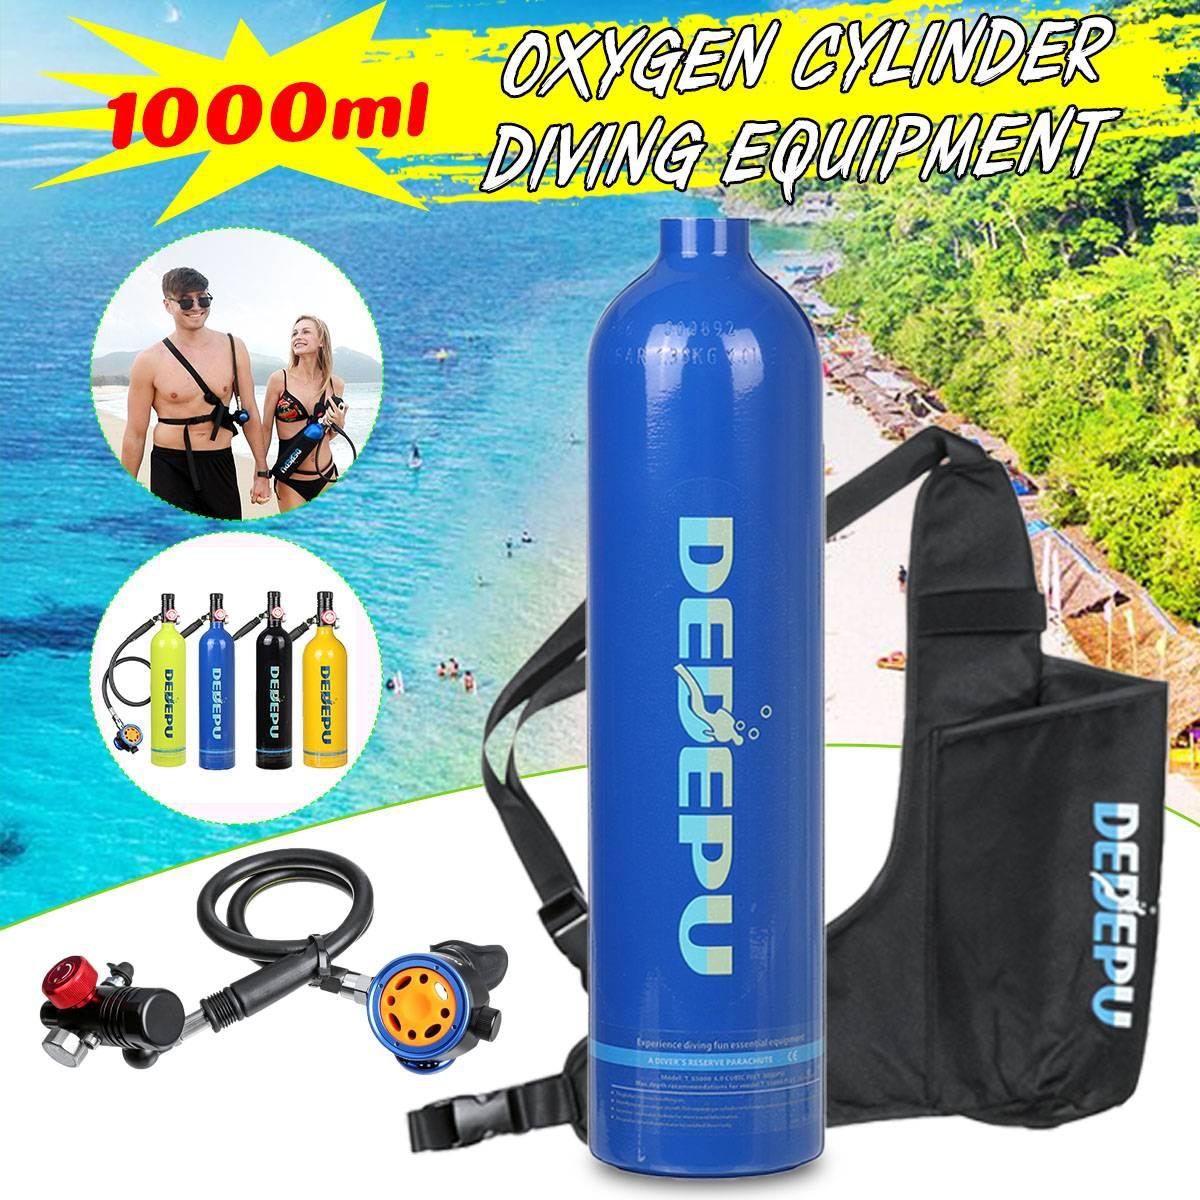 6 Stypes DEDEPU 1L, tanque de buceo portátil, cilindro de oxígeno, respirador de buceo, válvula de respiración, equipo de buceo, Set